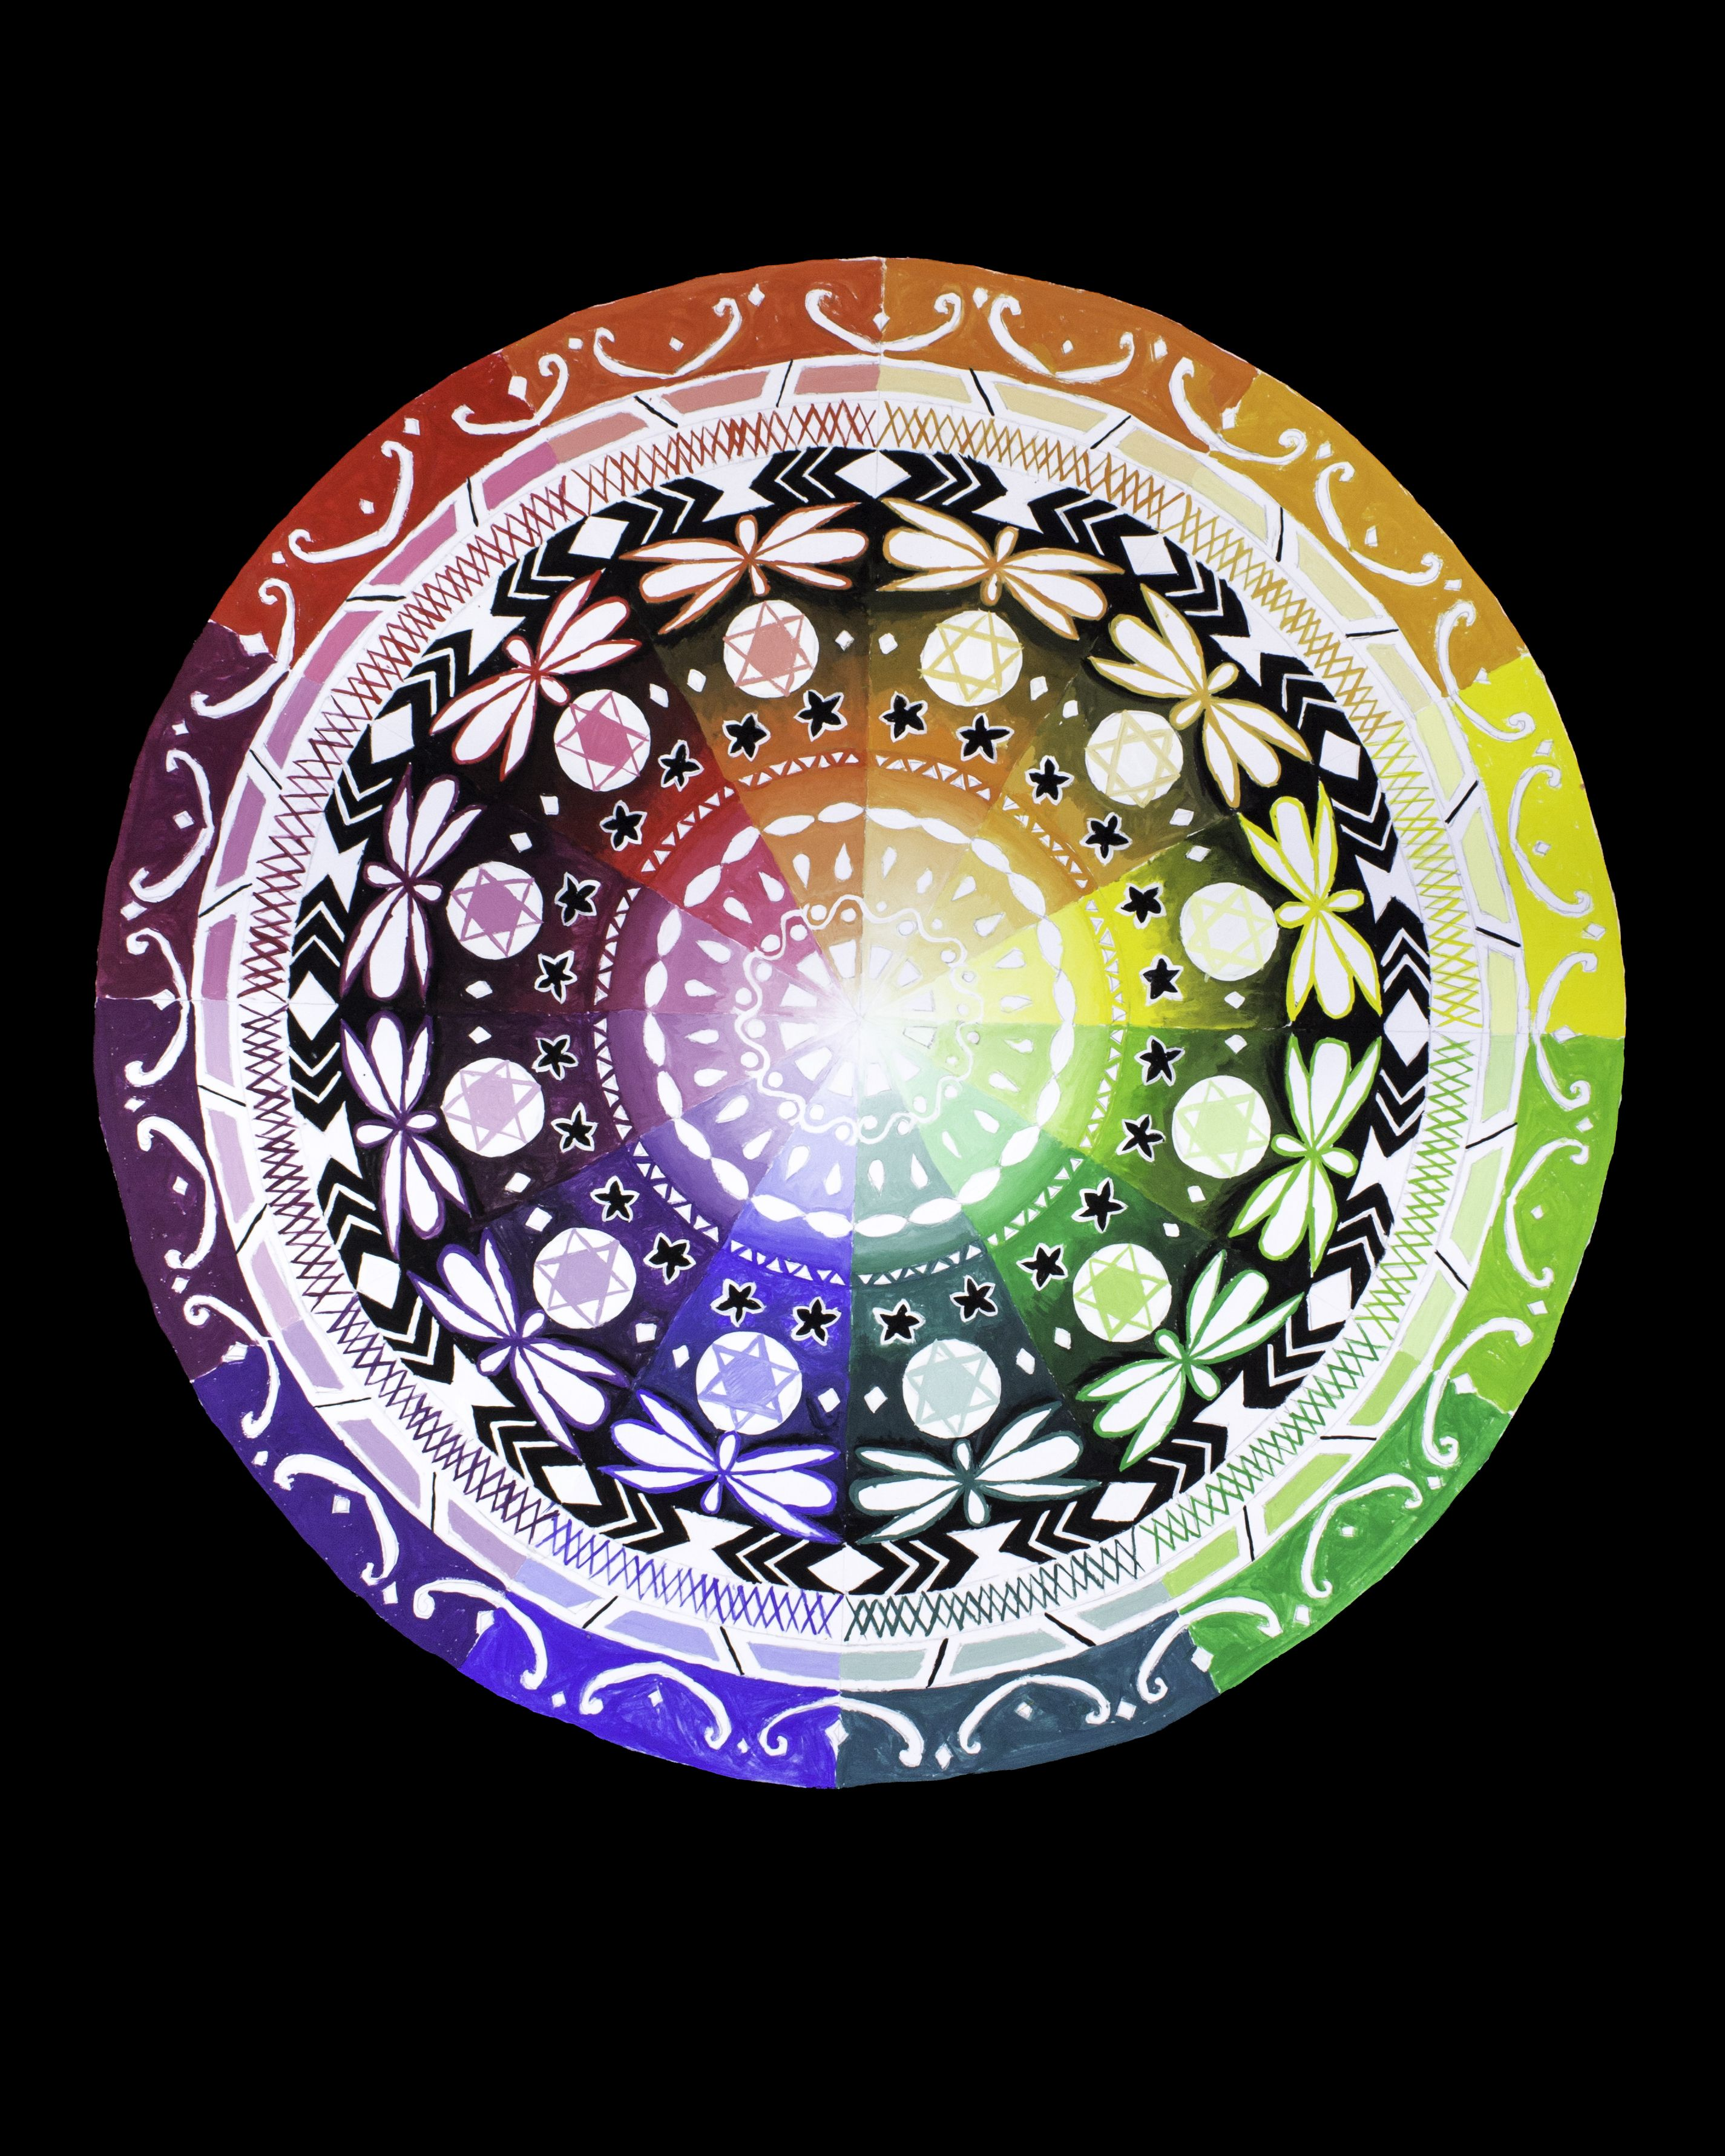 Color Wheel Mandalas Students Used A 1 12 Circle Template